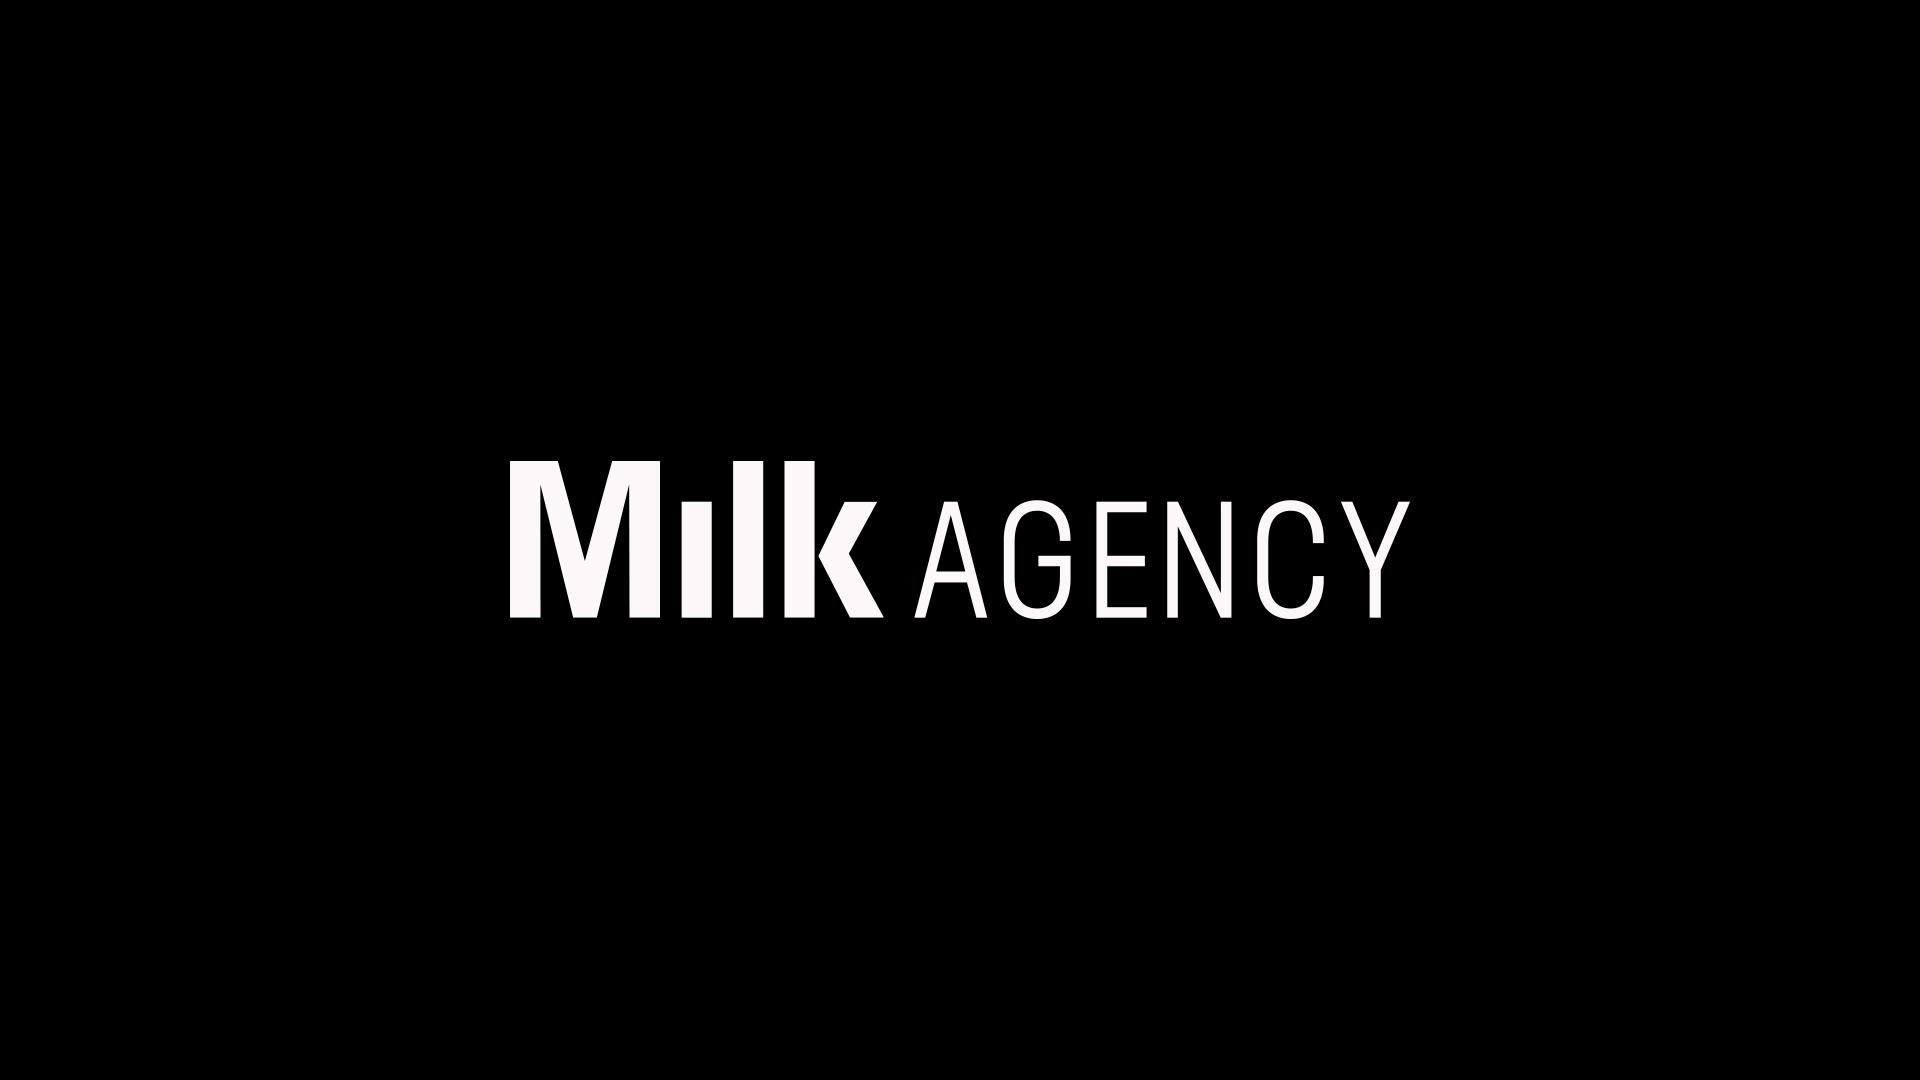 milk-agency.jpg